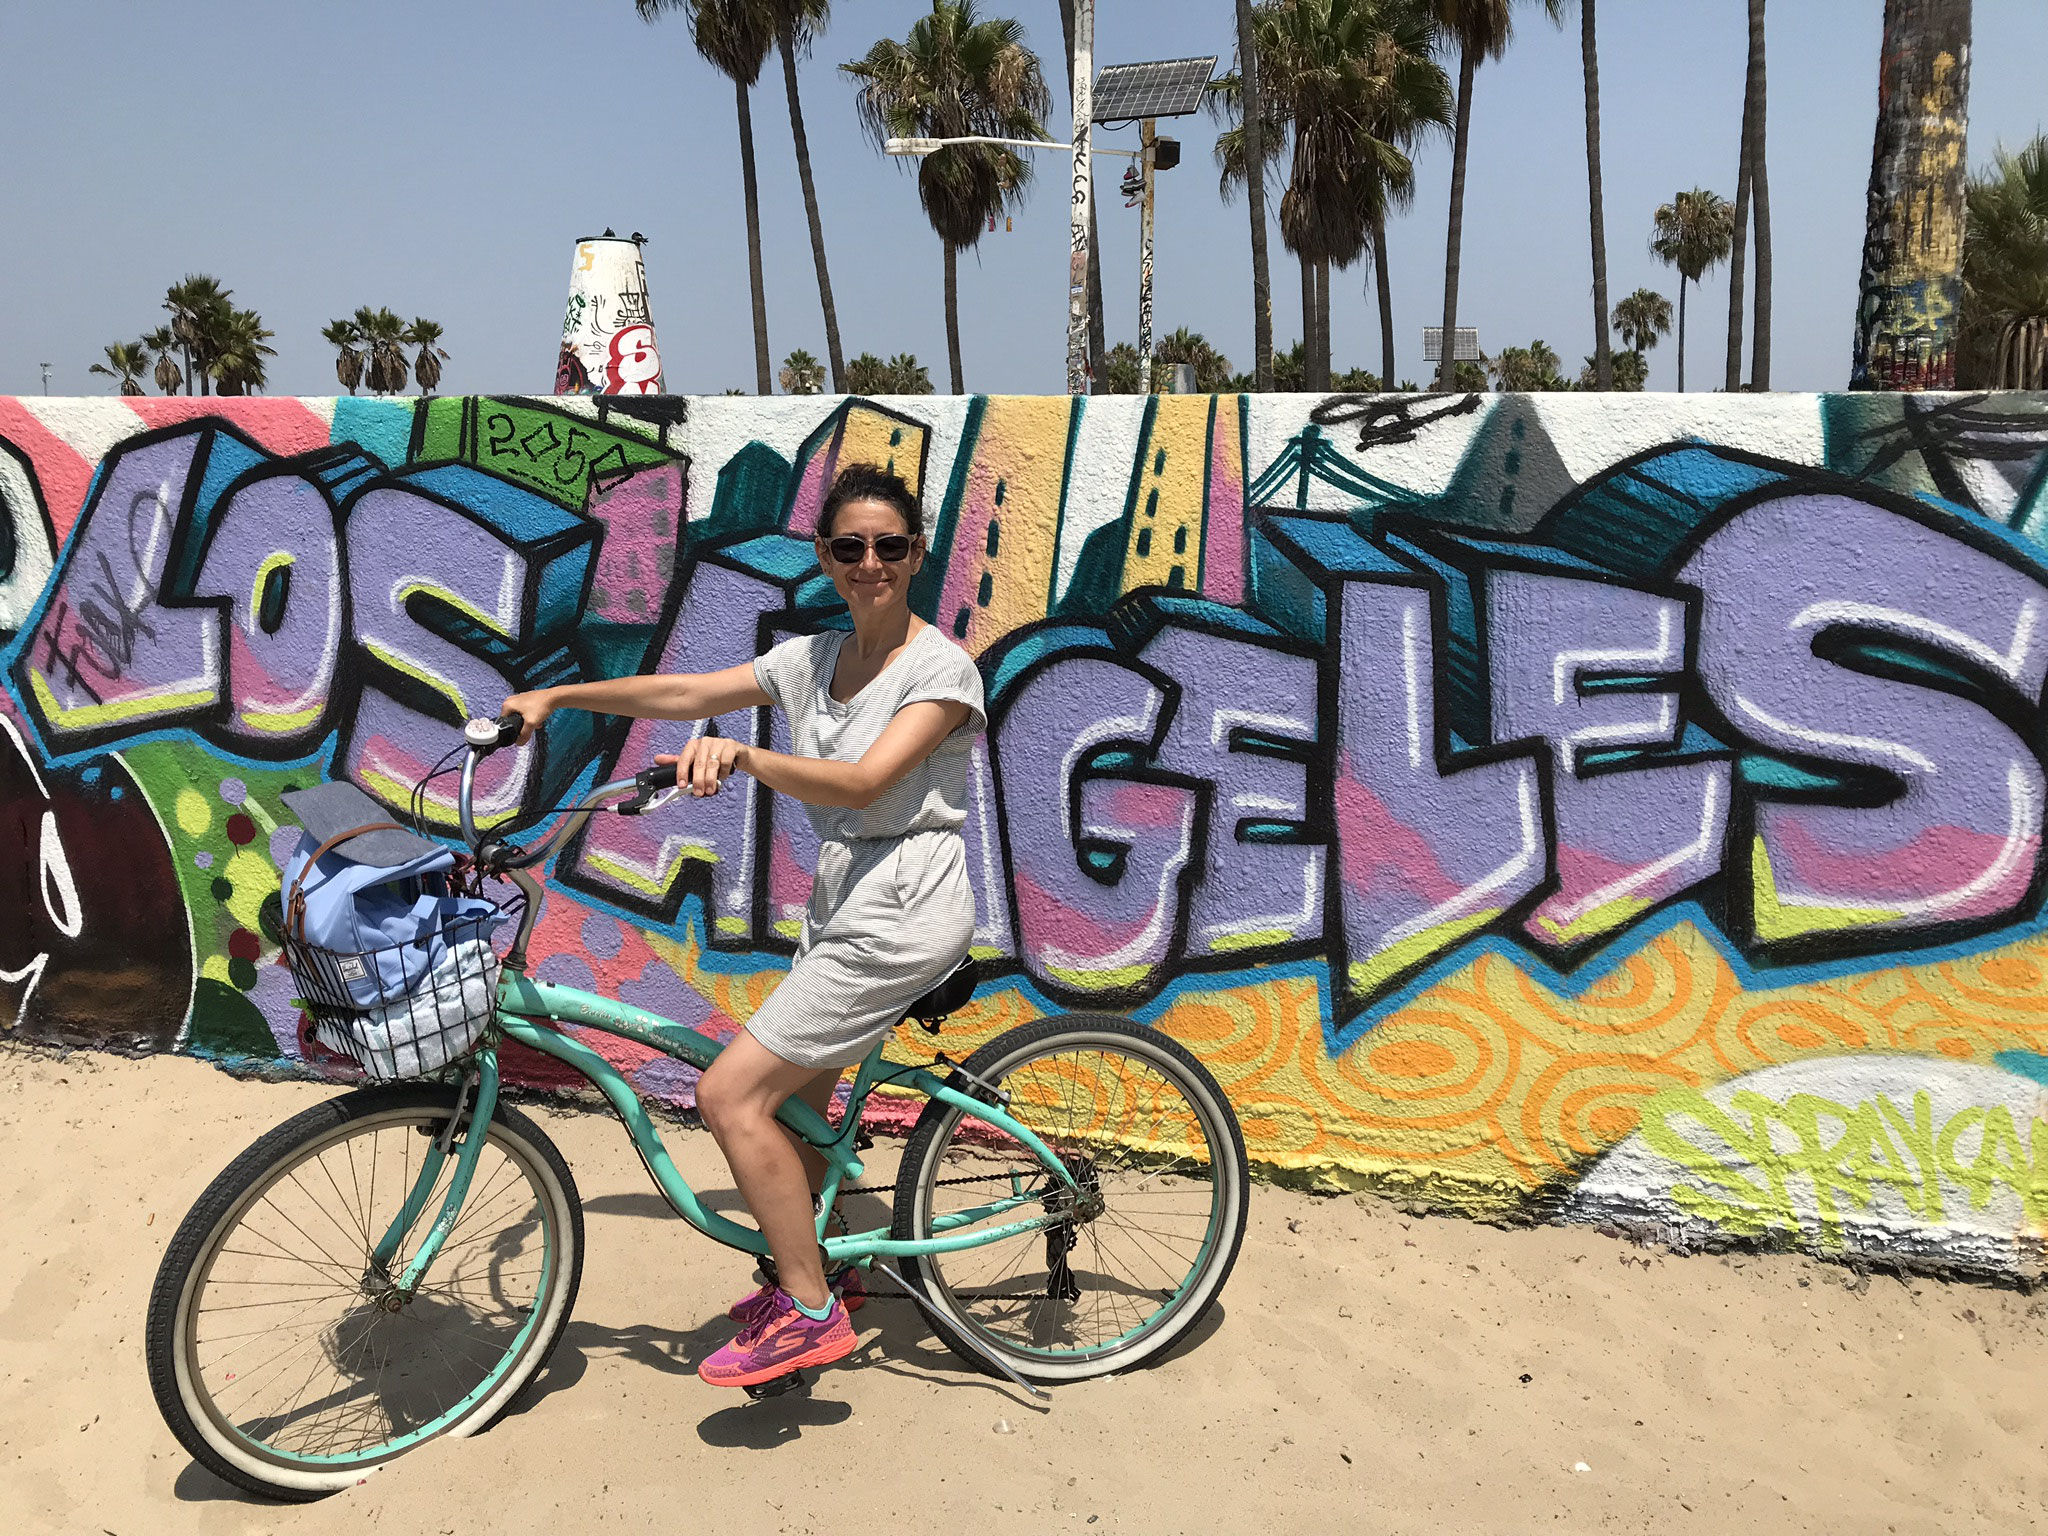 Roadtrip Los Angeles  Mamicheckch Erholsame Ferien dank